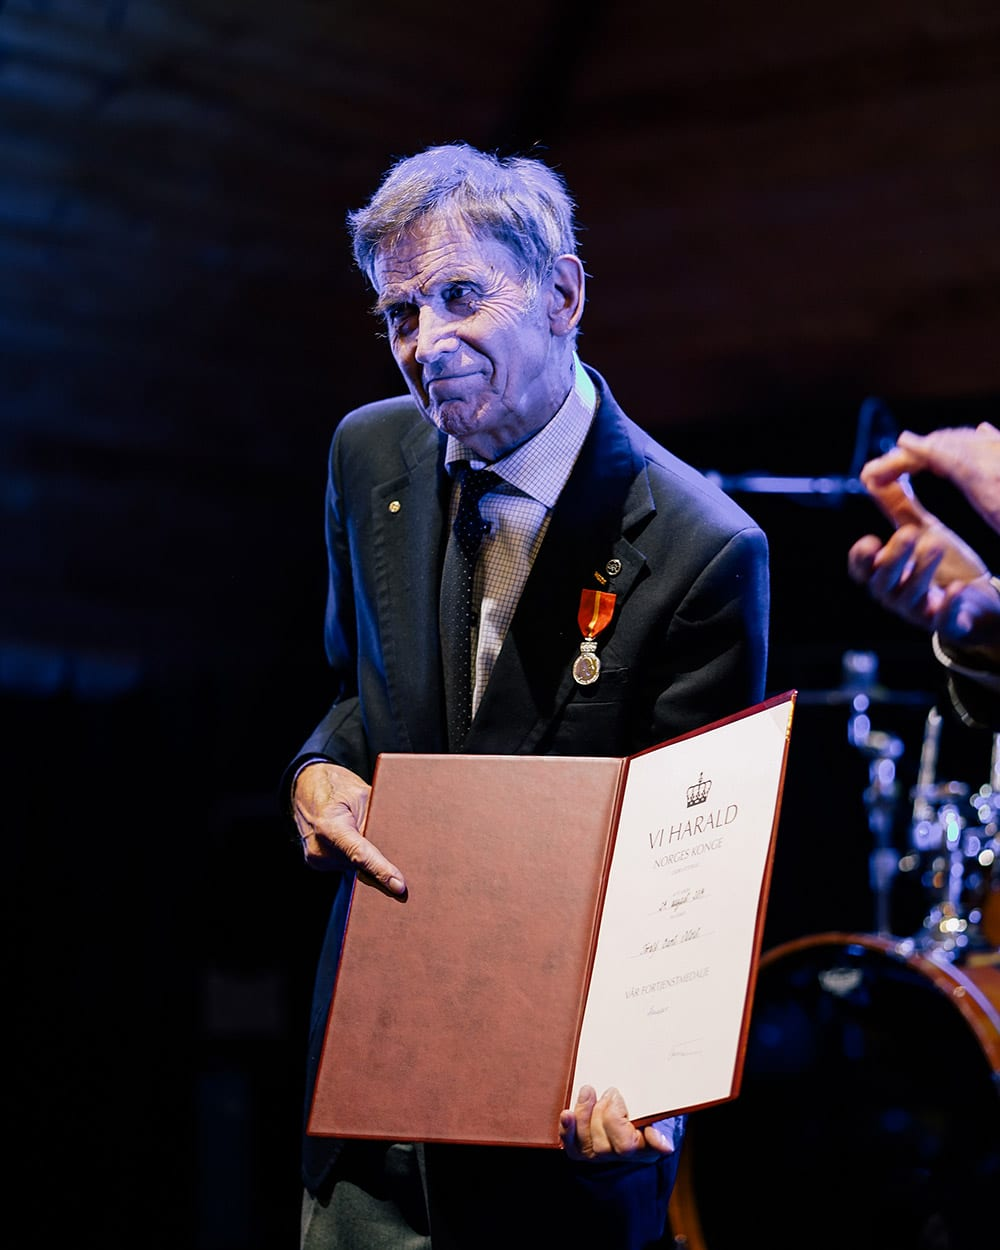 Toralf Bernt Metveit mottar Kongens Fortjenstmedalje 4. oktober 2019. Foto: Anna Rogneby